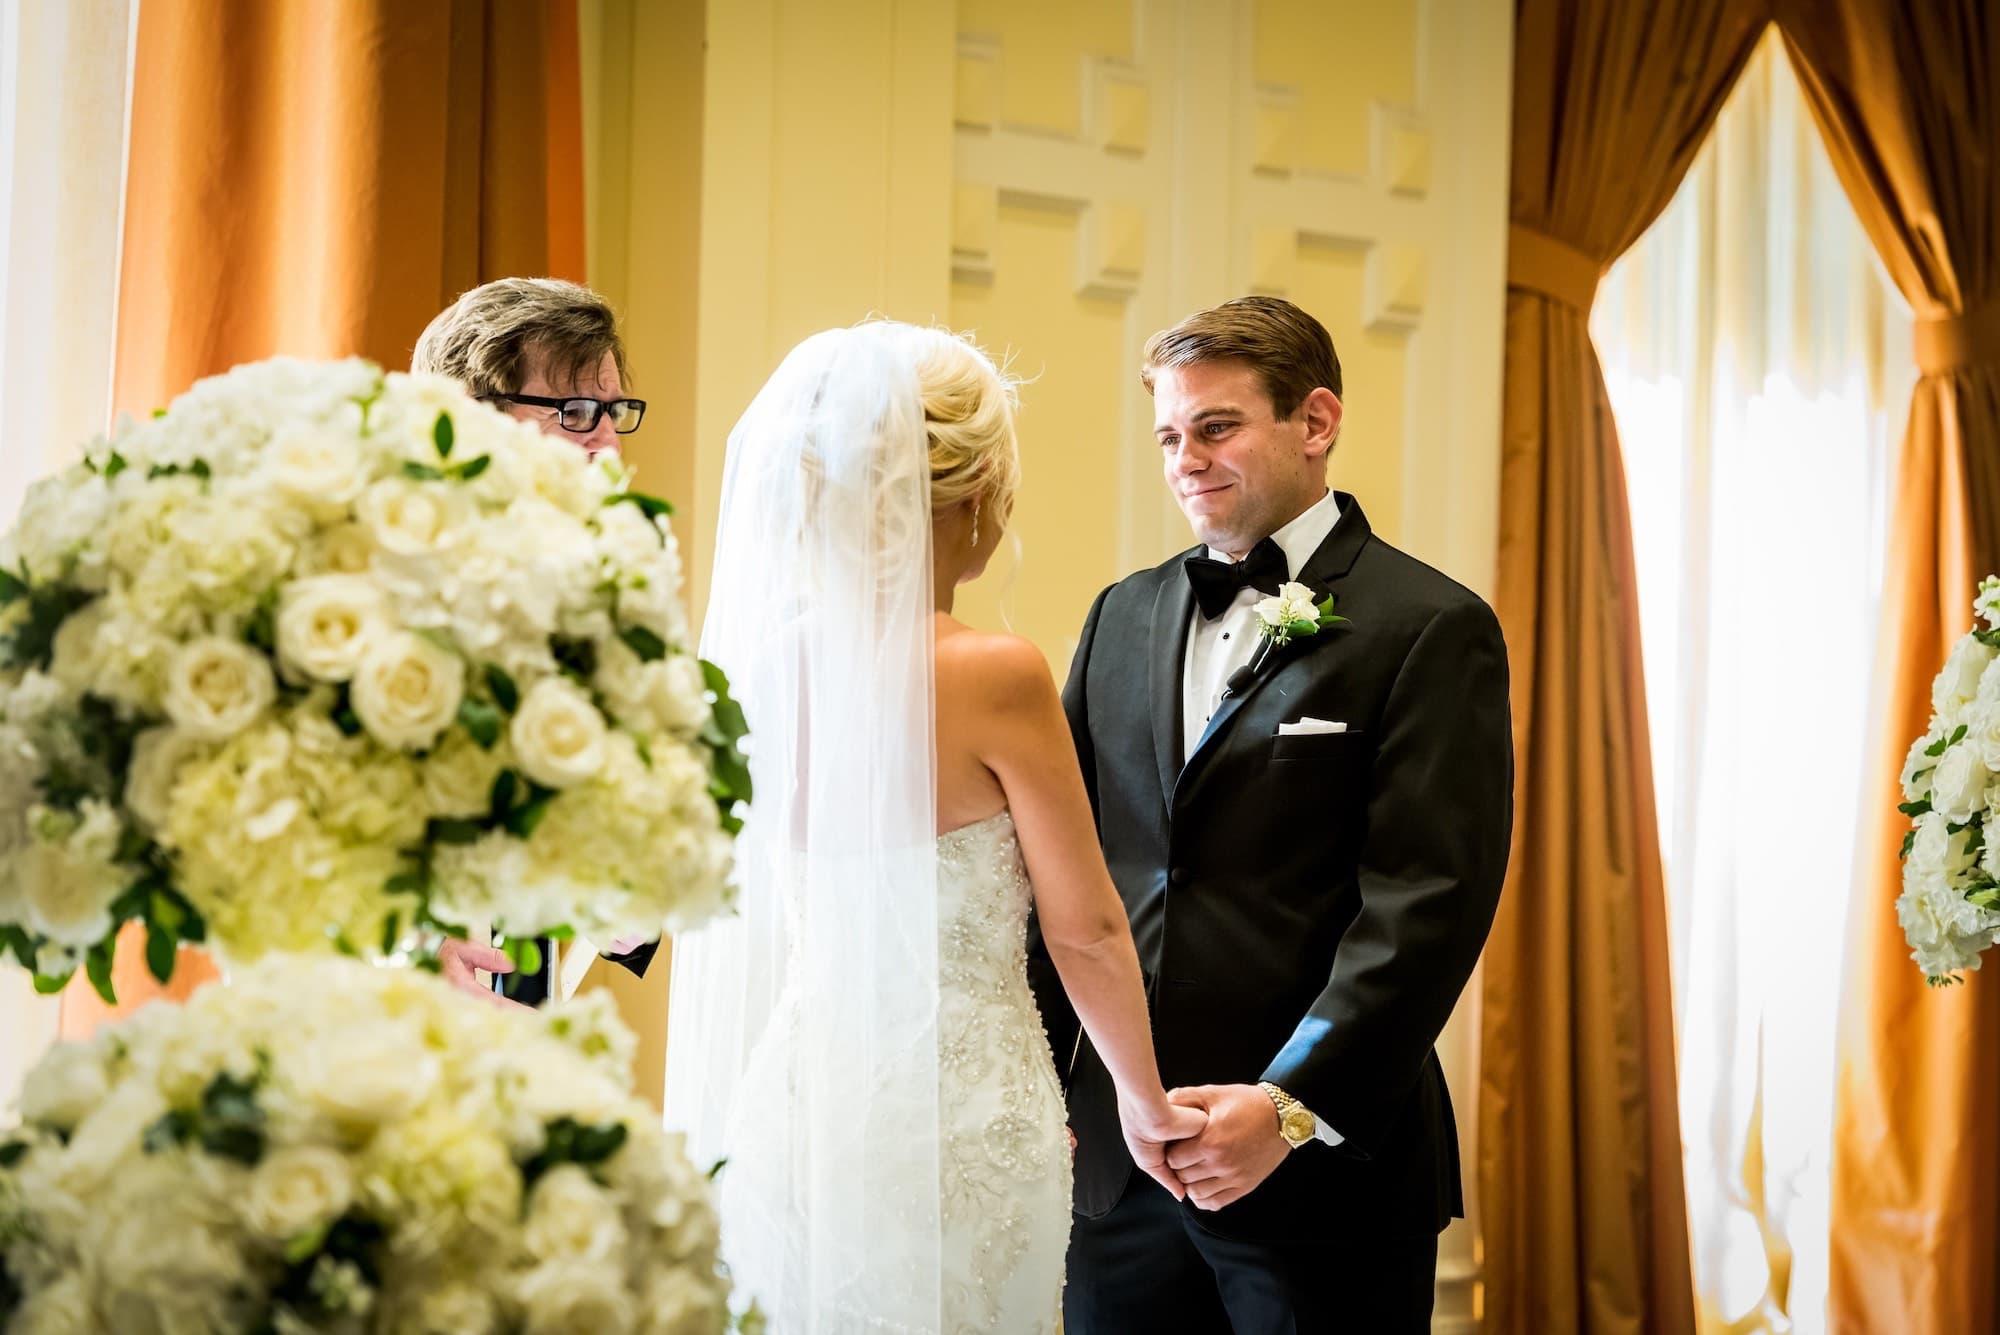 groom looking at bride in ceremony